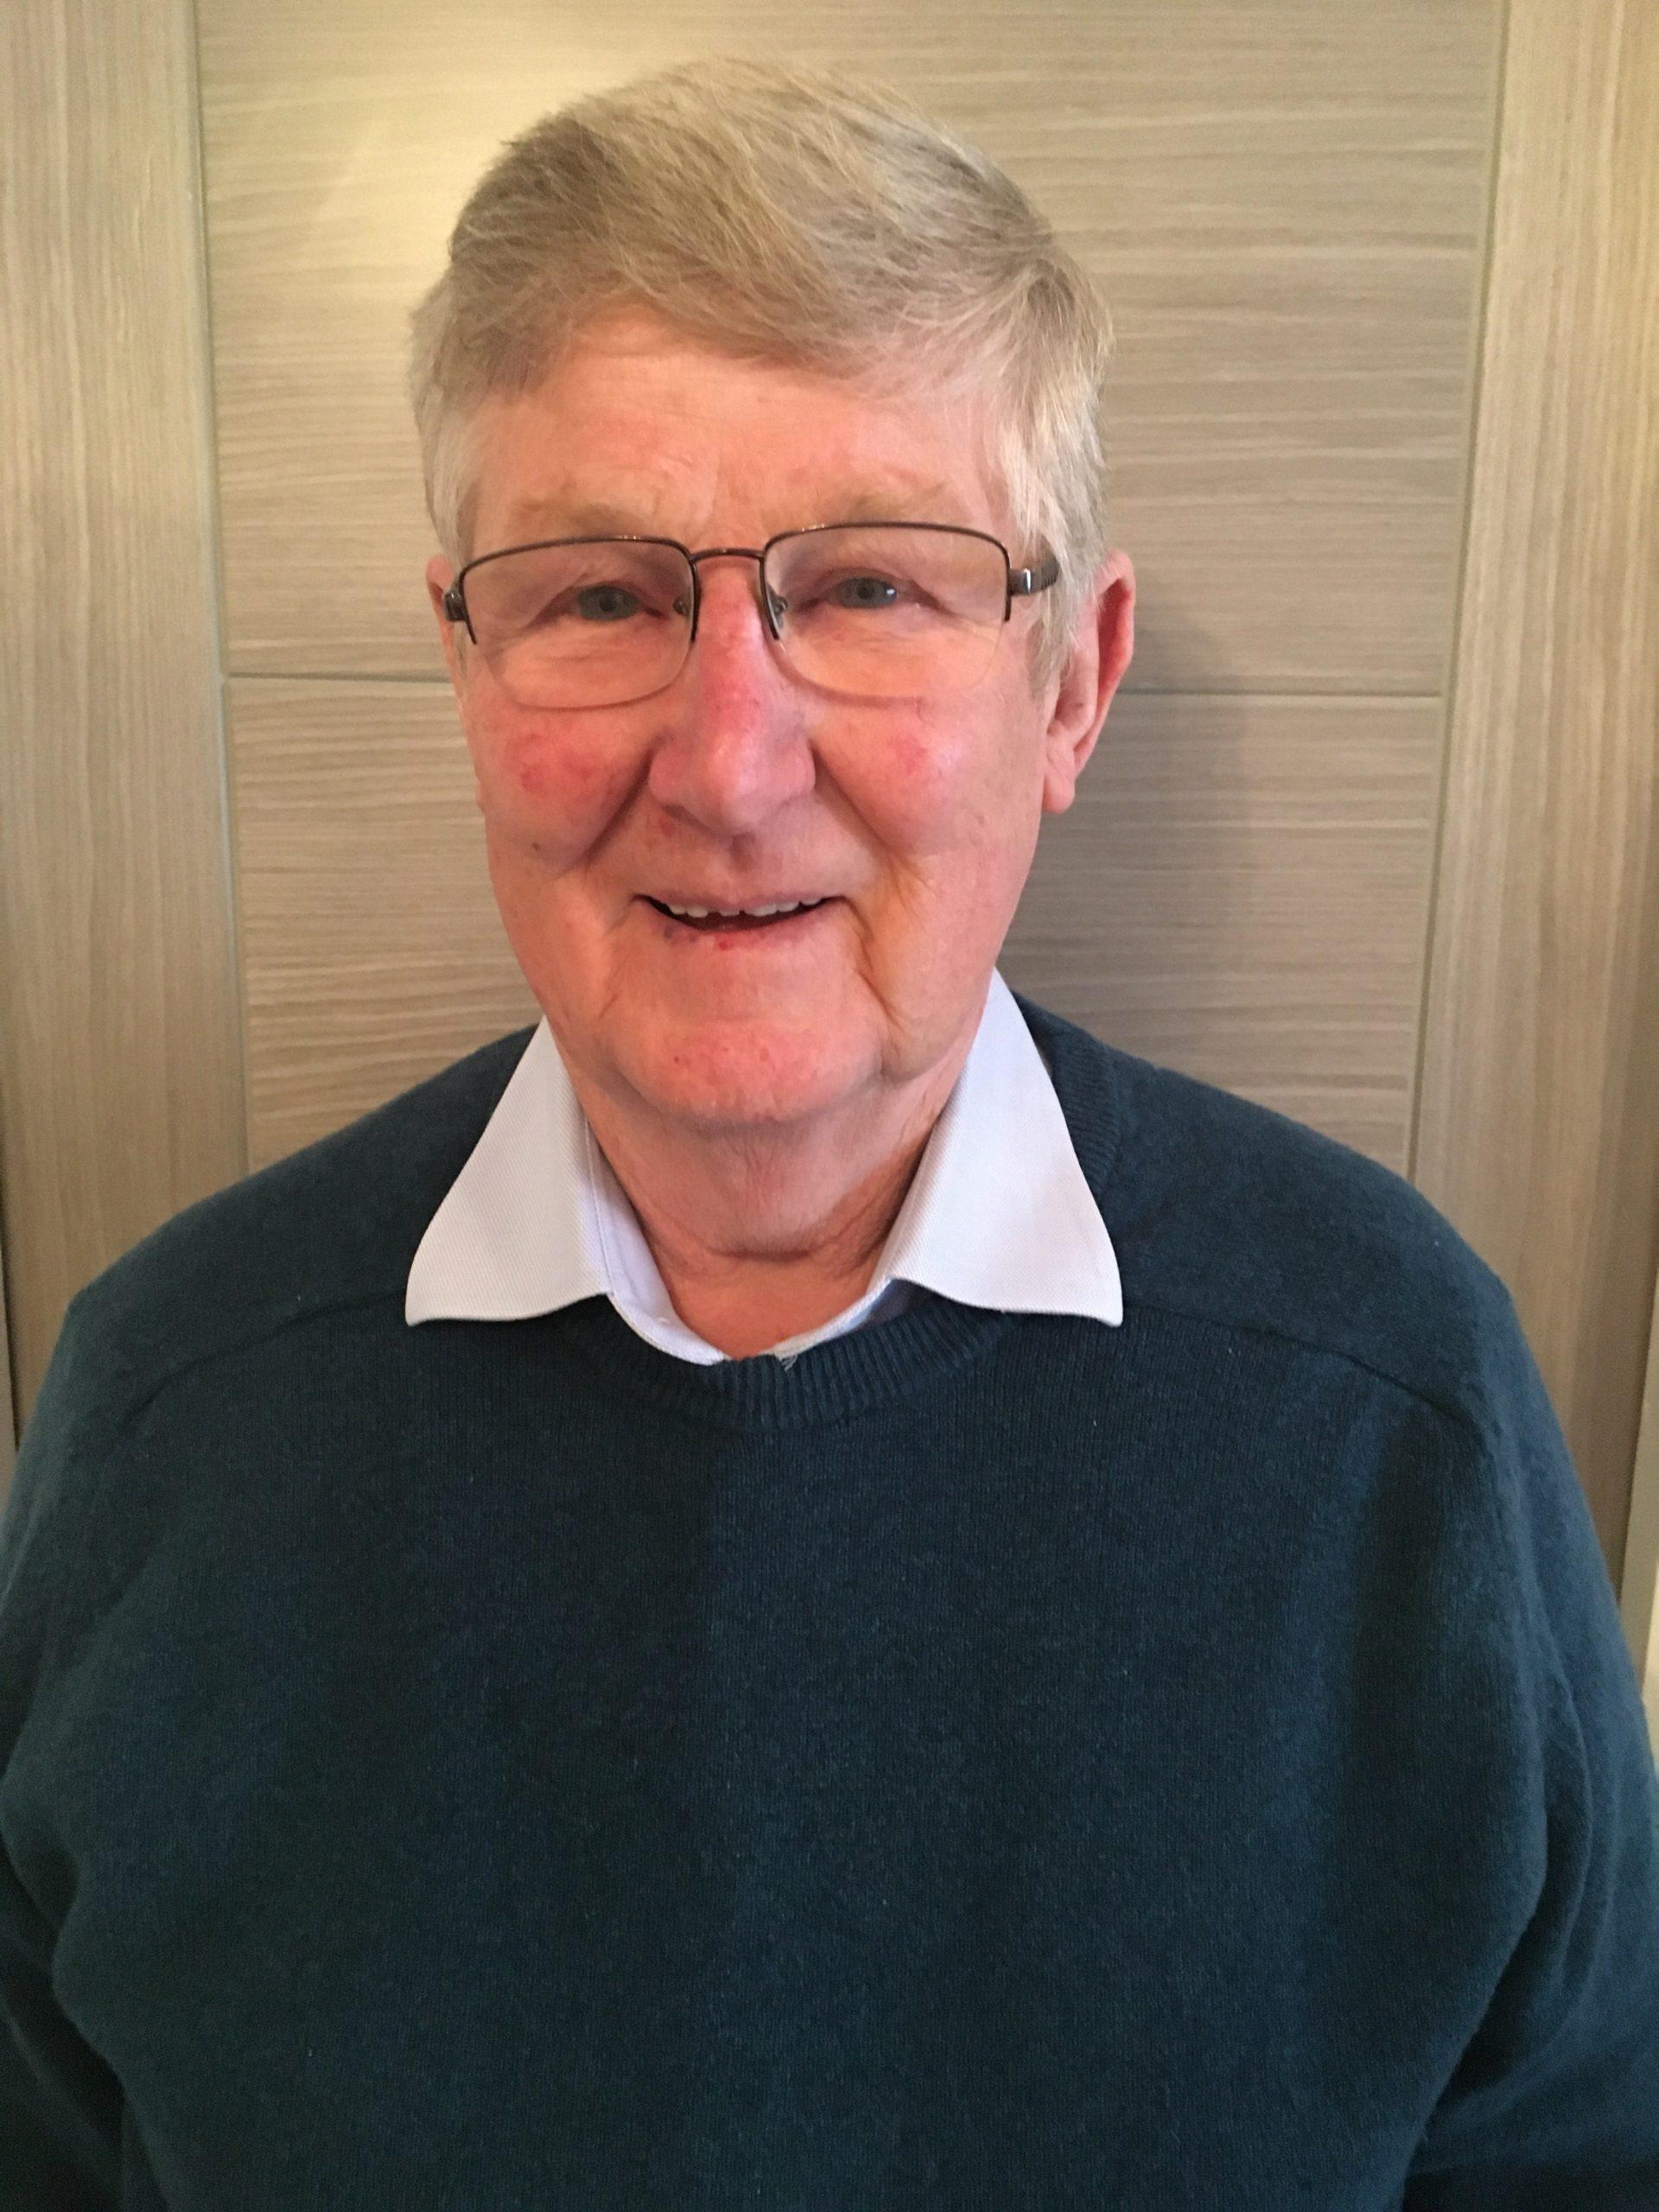 Royal Navy Veteran Mr Reginald Fort succeeds!